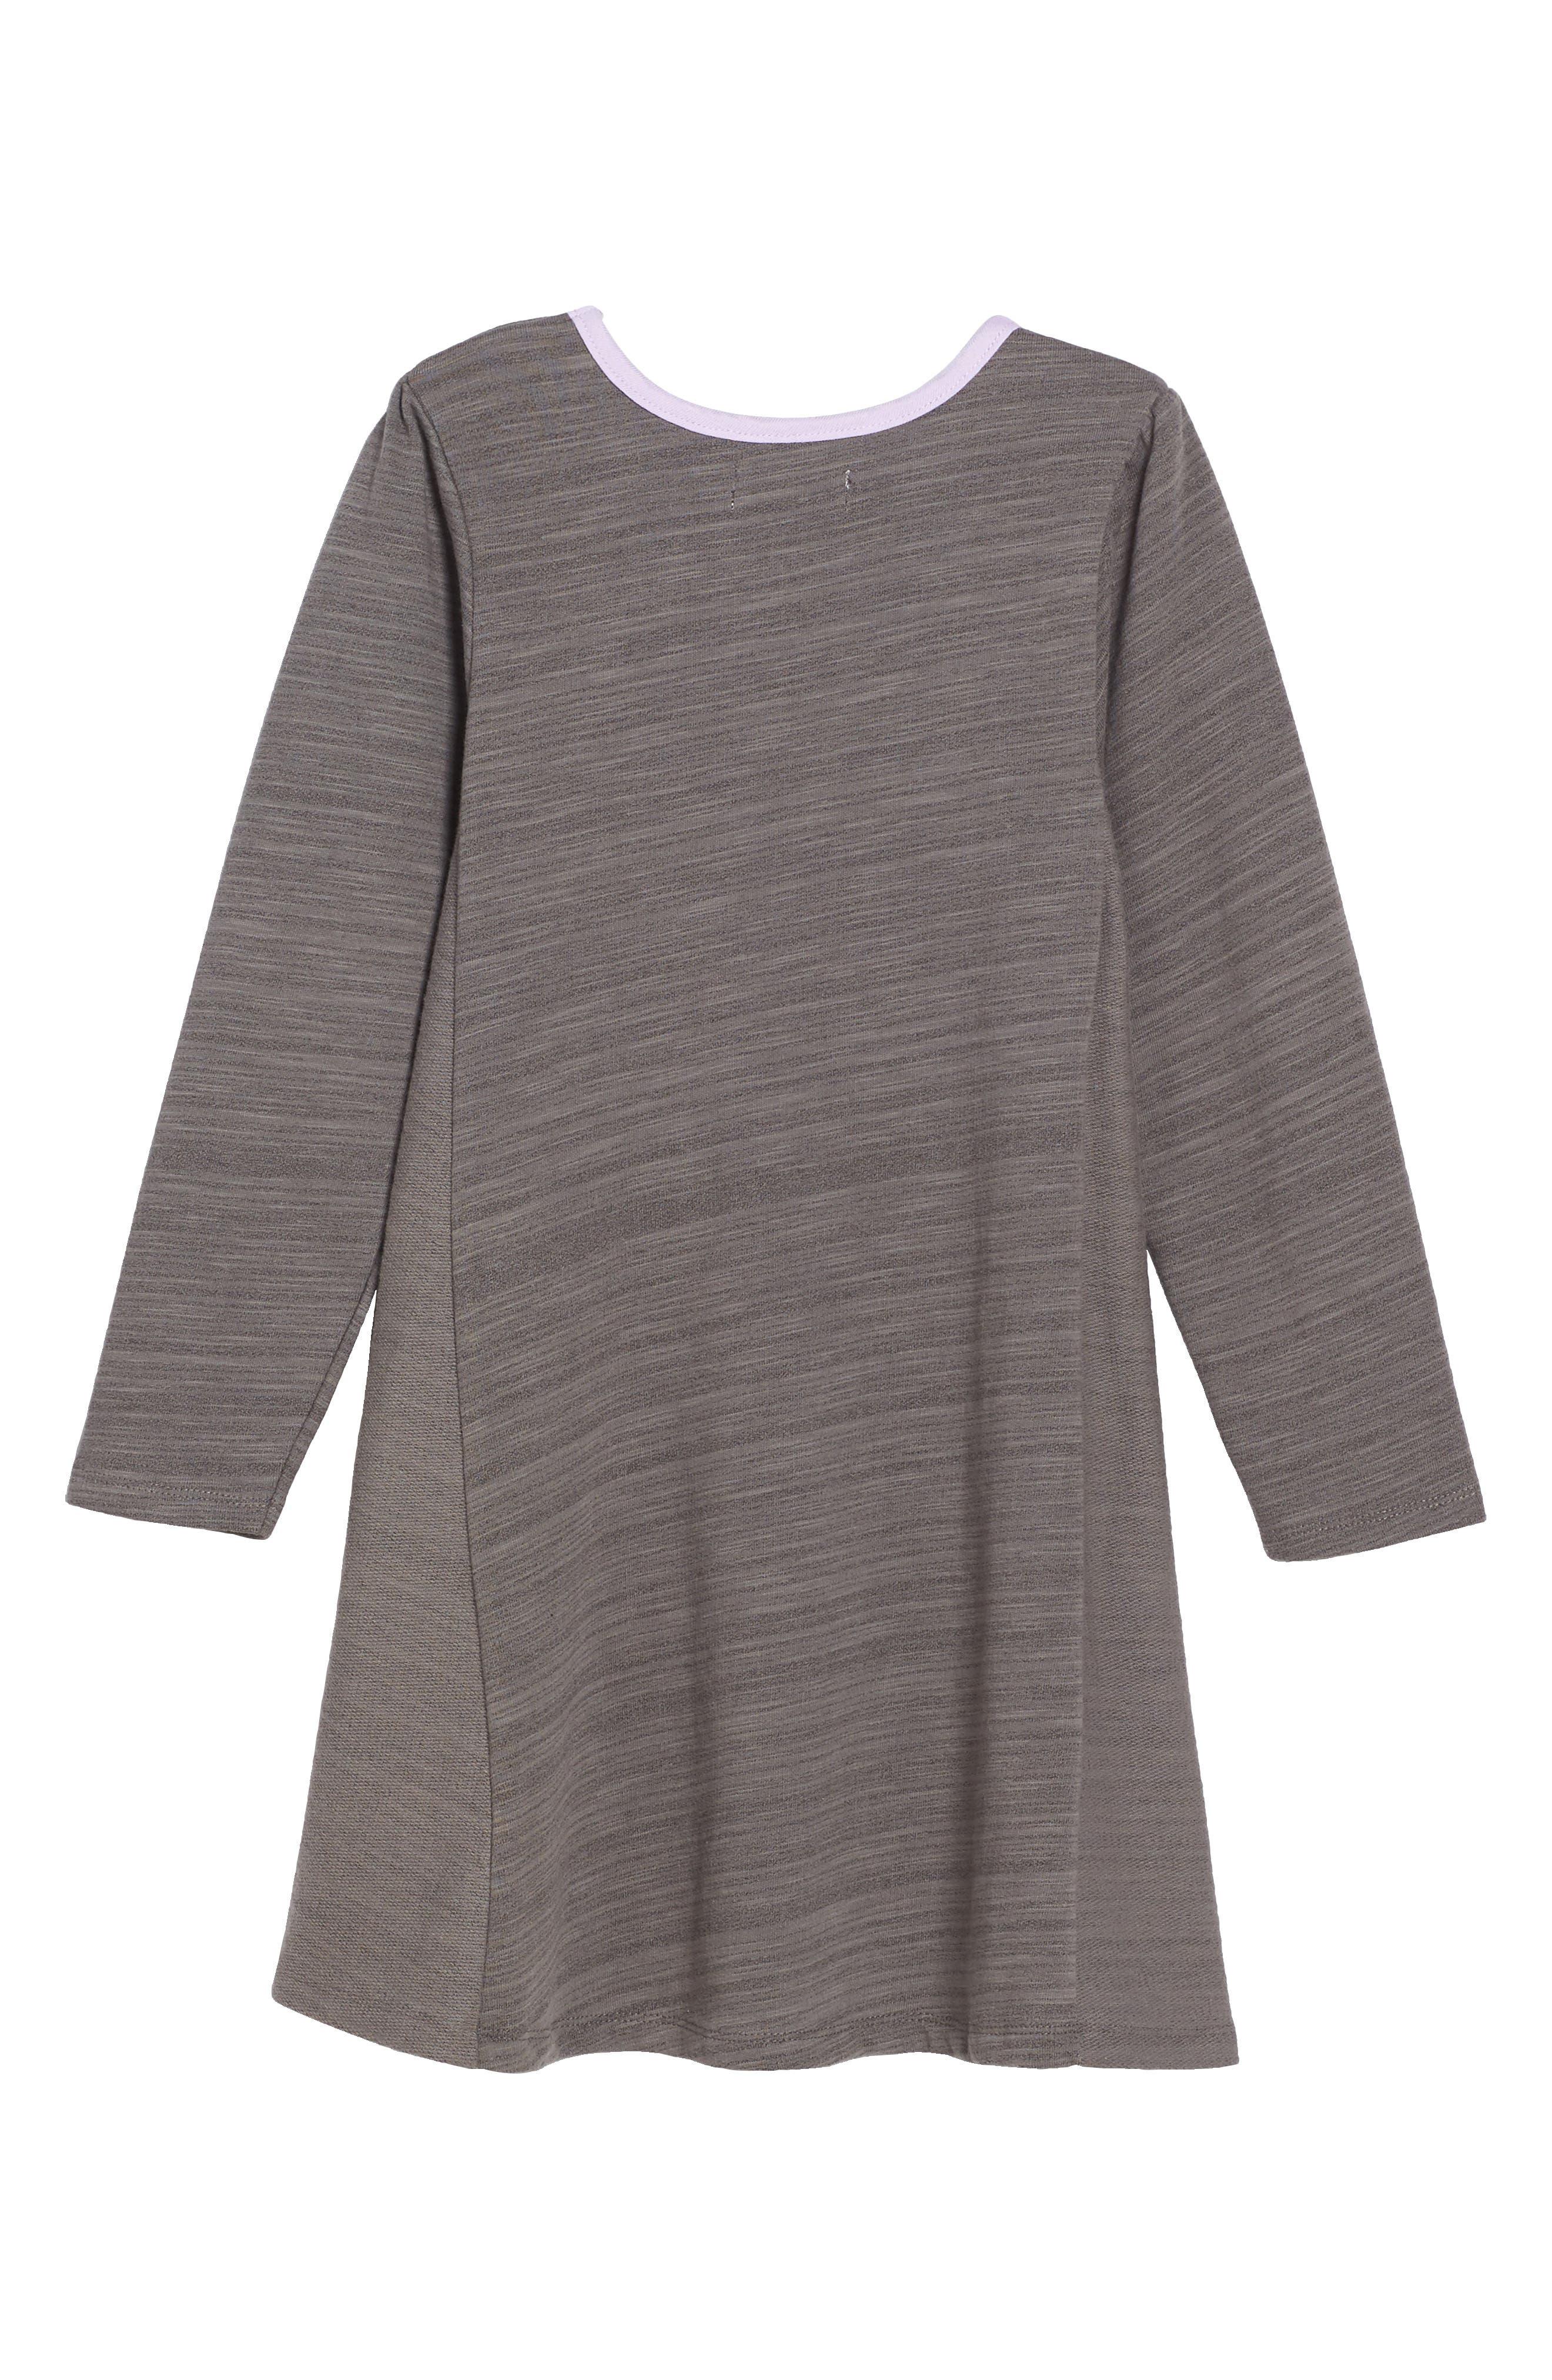 Sienna Dress,                             Alternate thumbnail 2, color,